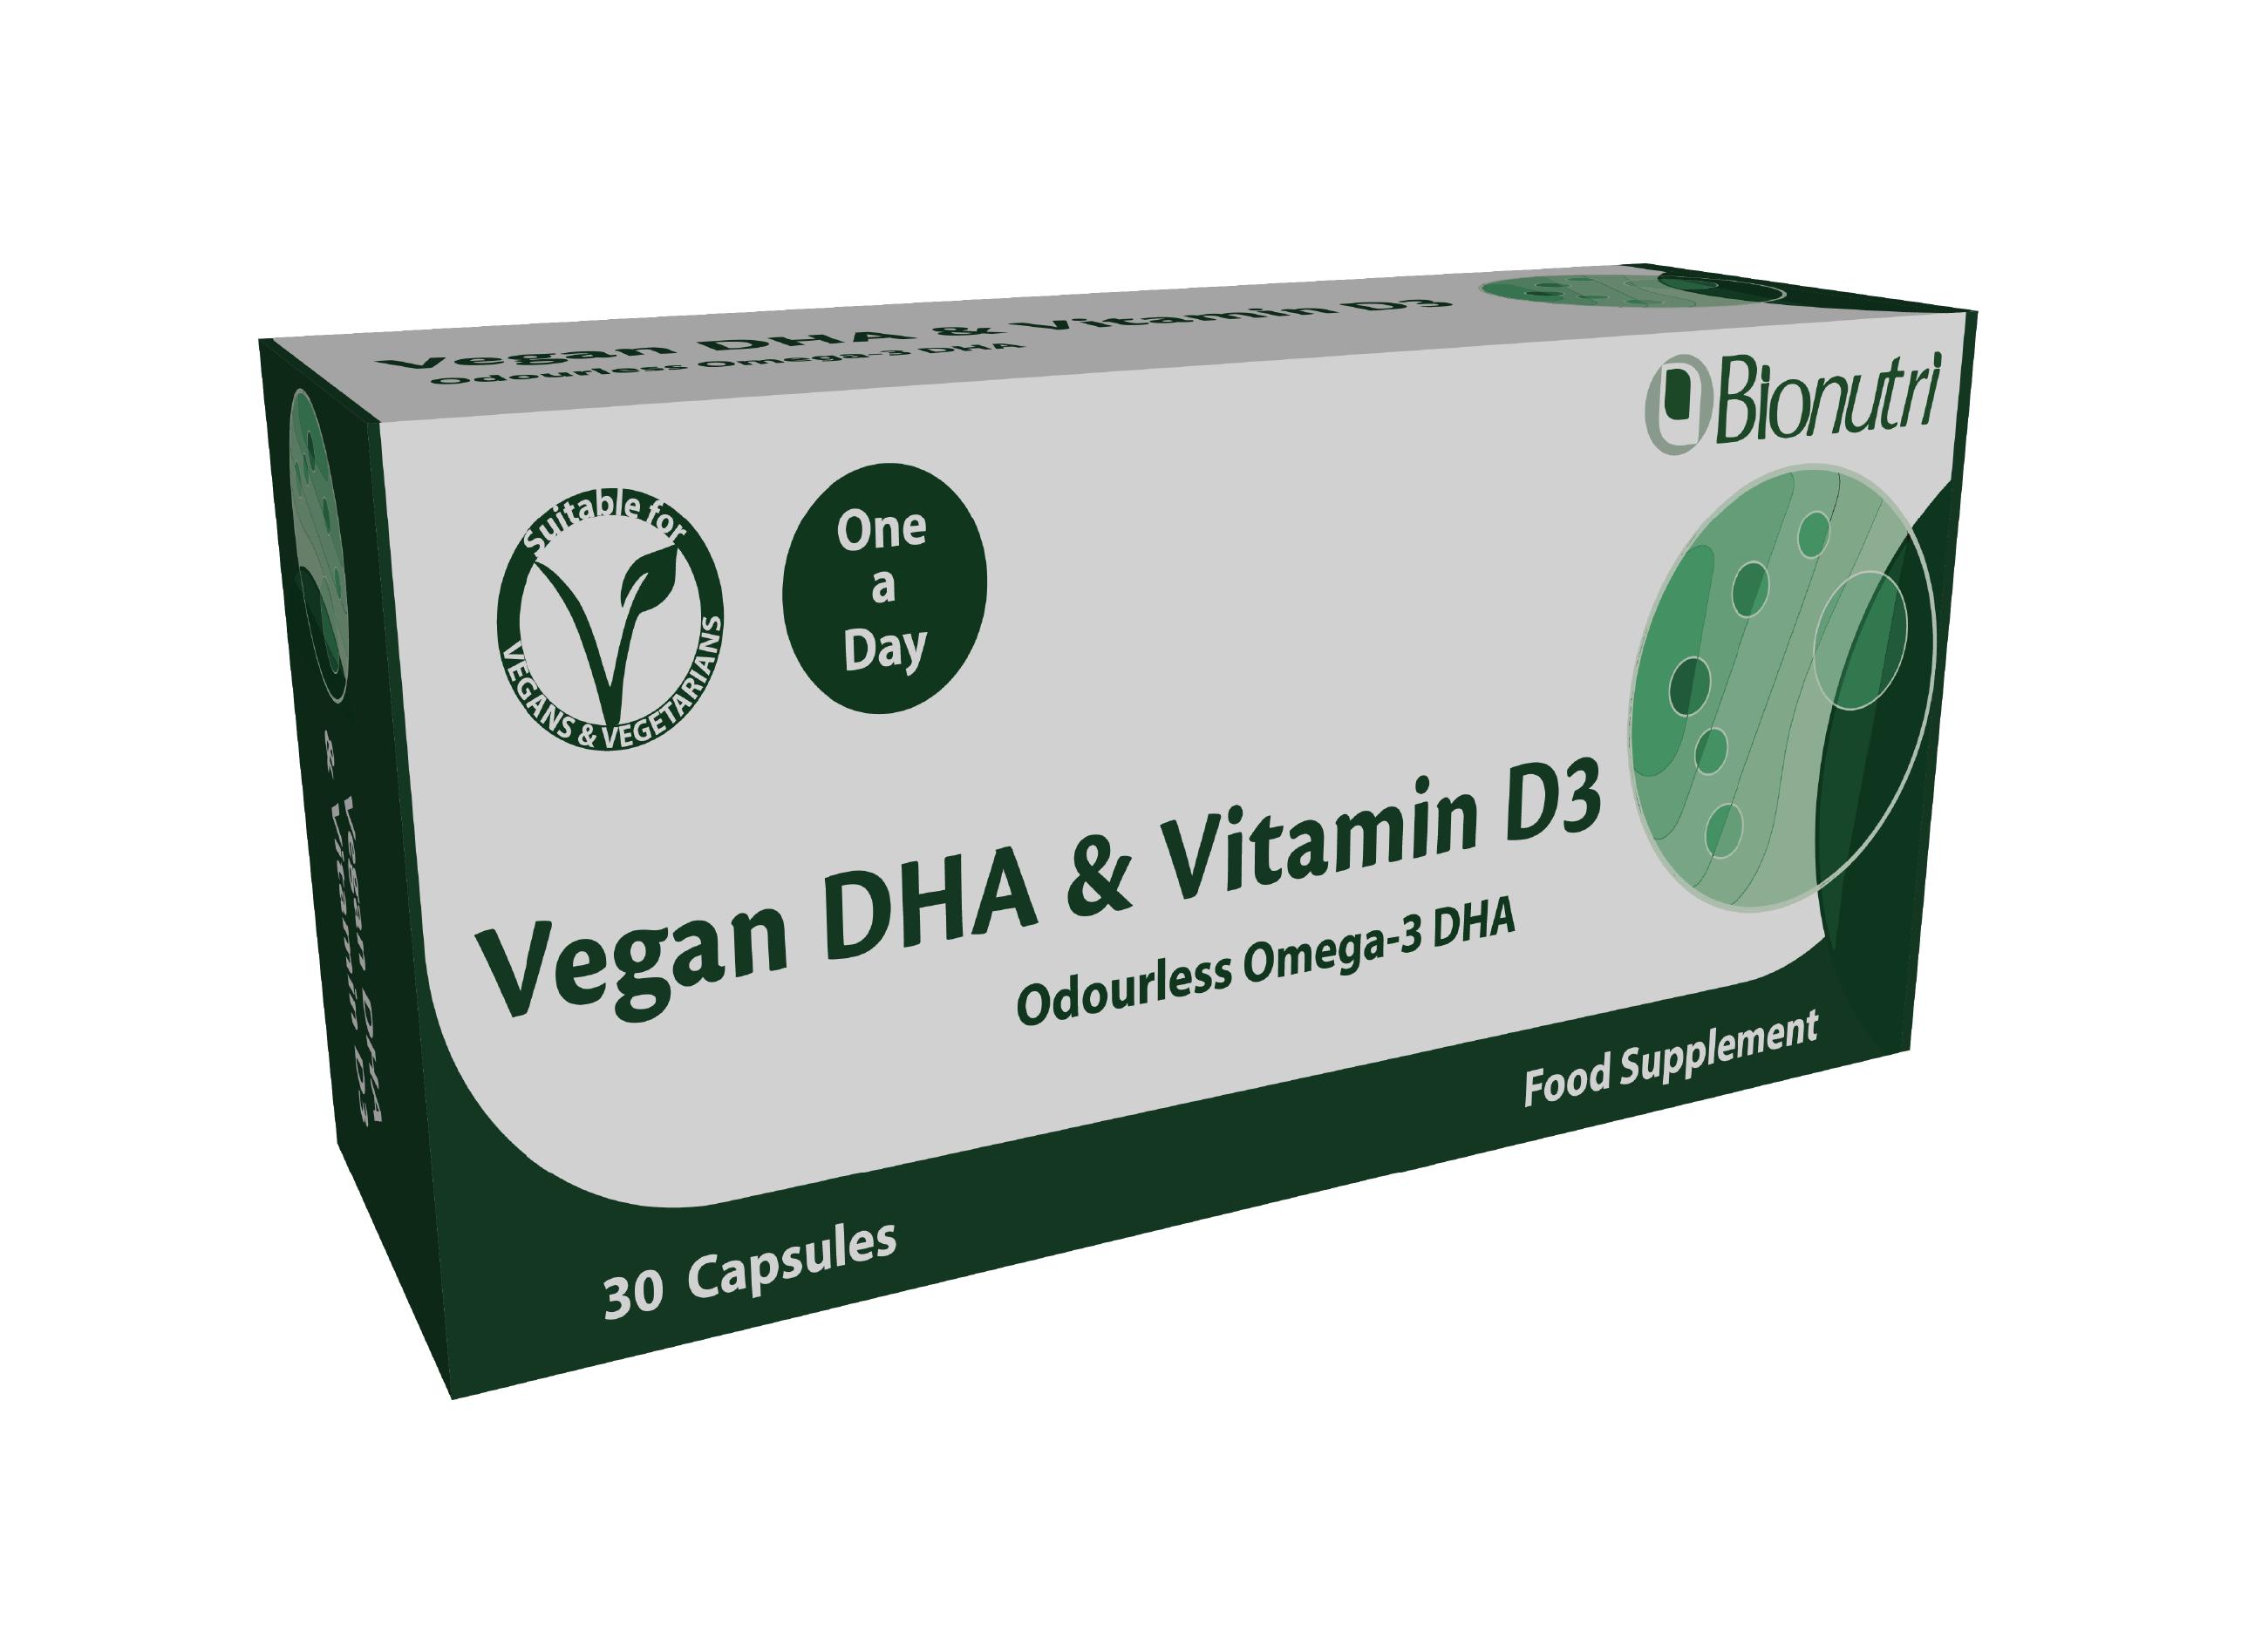 Vegan DHA & Vitamin D3 30's